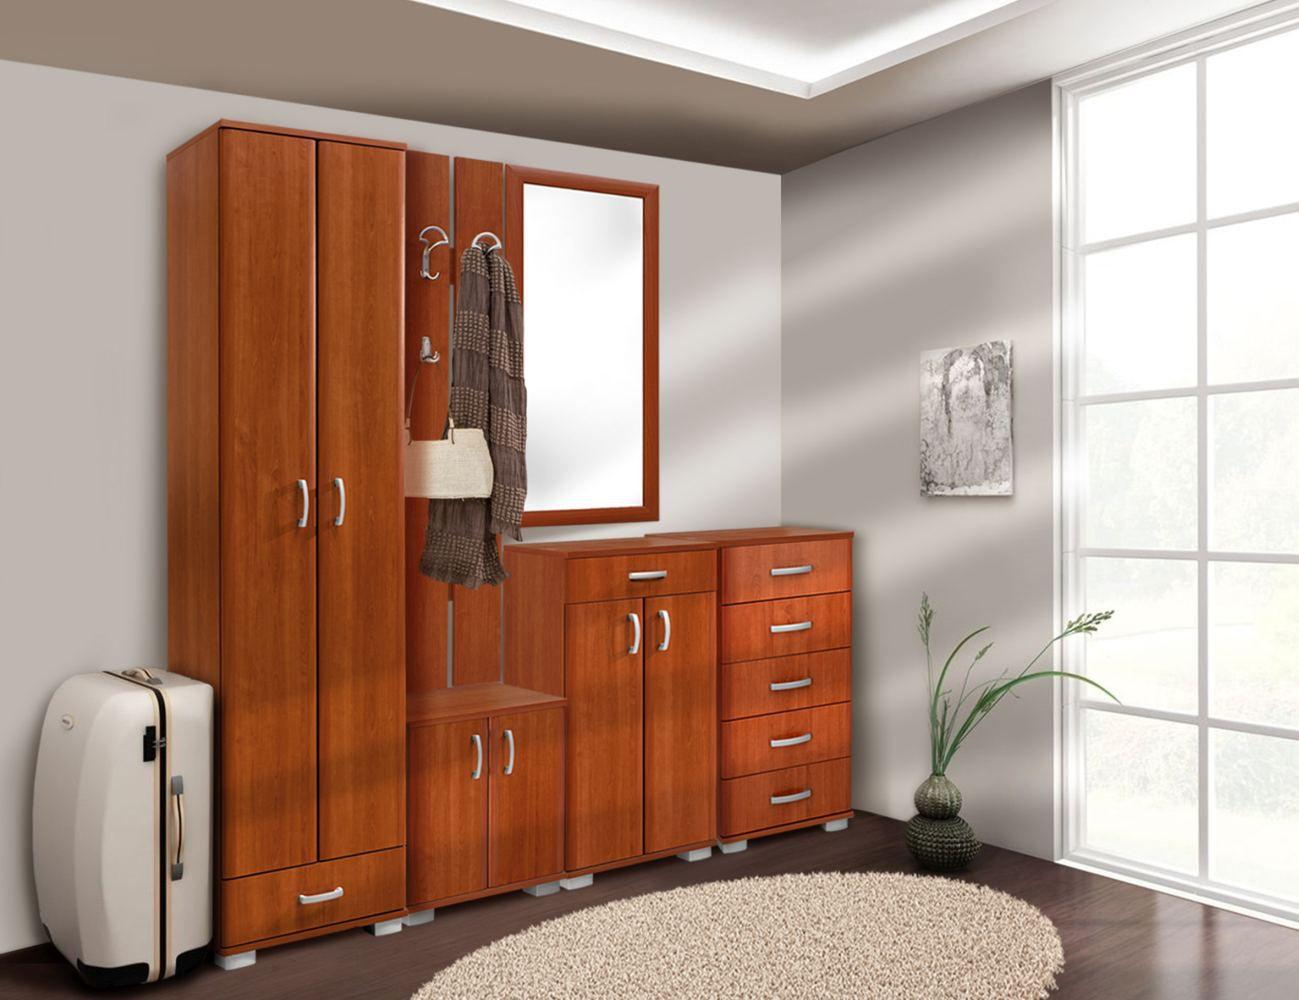 Garderobe Komplett - Set A Tudela, 5-teilig, Farbe: Kirsche